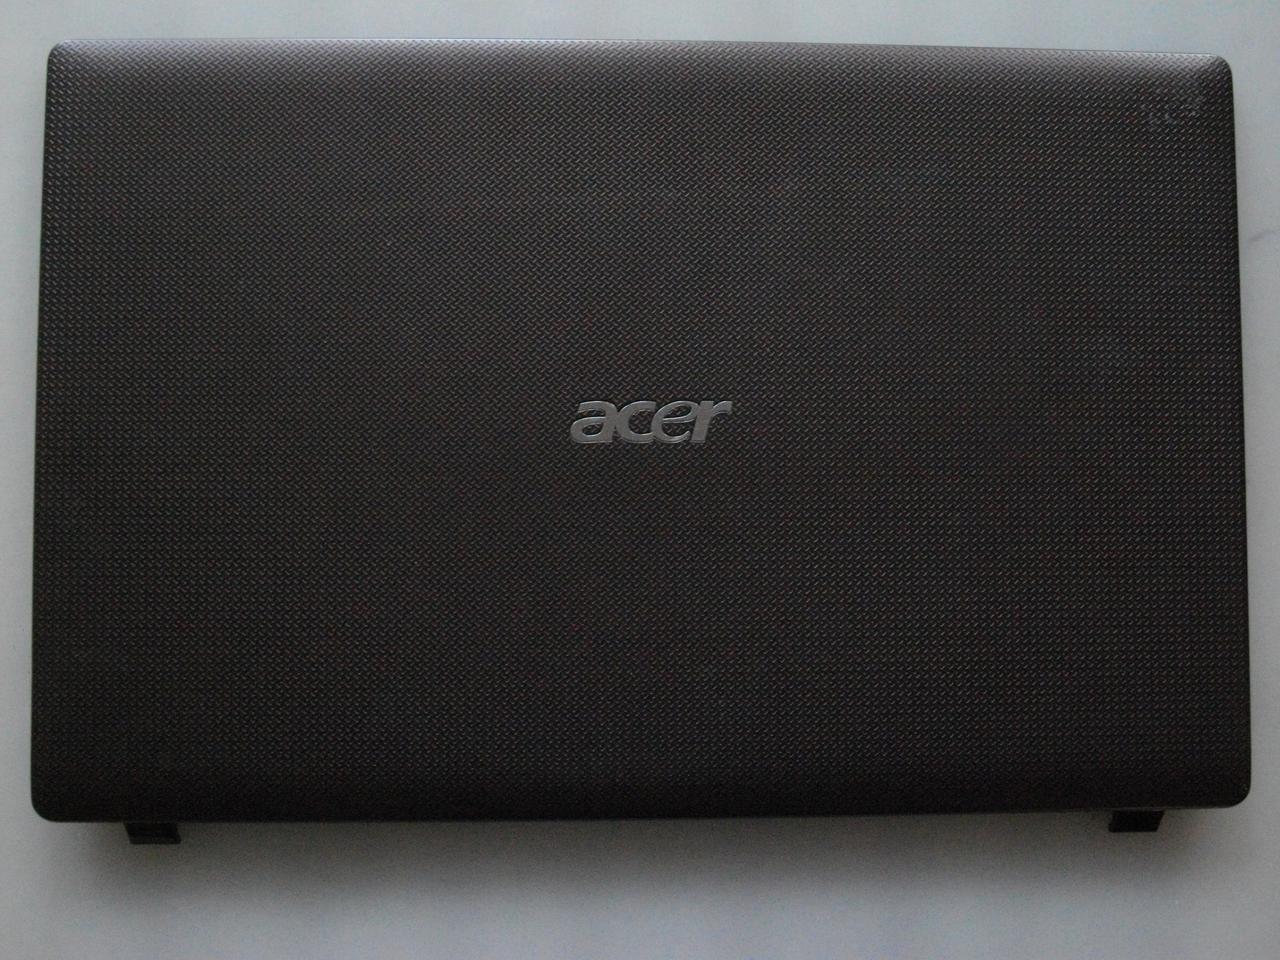 Корпус Кришка матриці Acer Aspire 5742G, 5742, PEW71, 5251, 5551, 5741, бо 5742